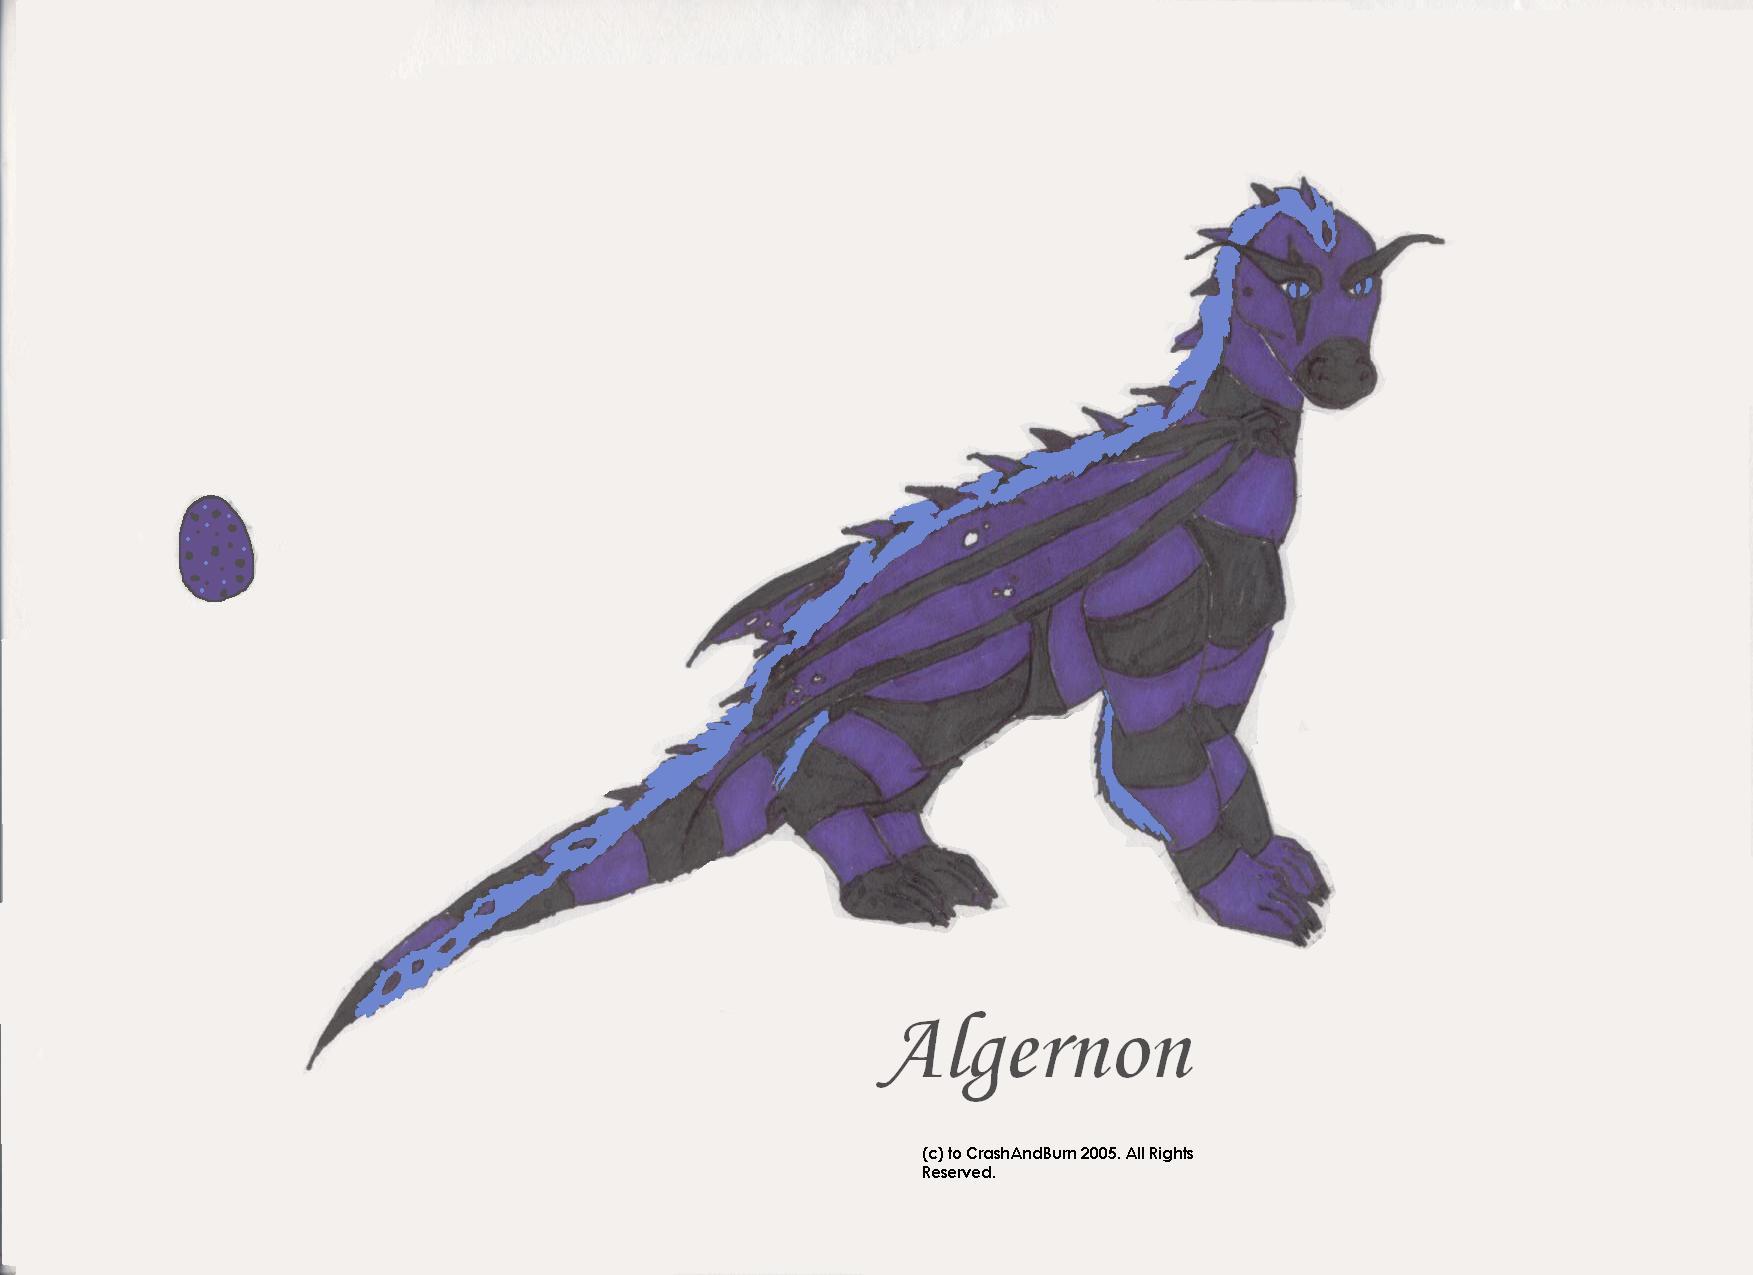 Algernon by CrashAndBurn